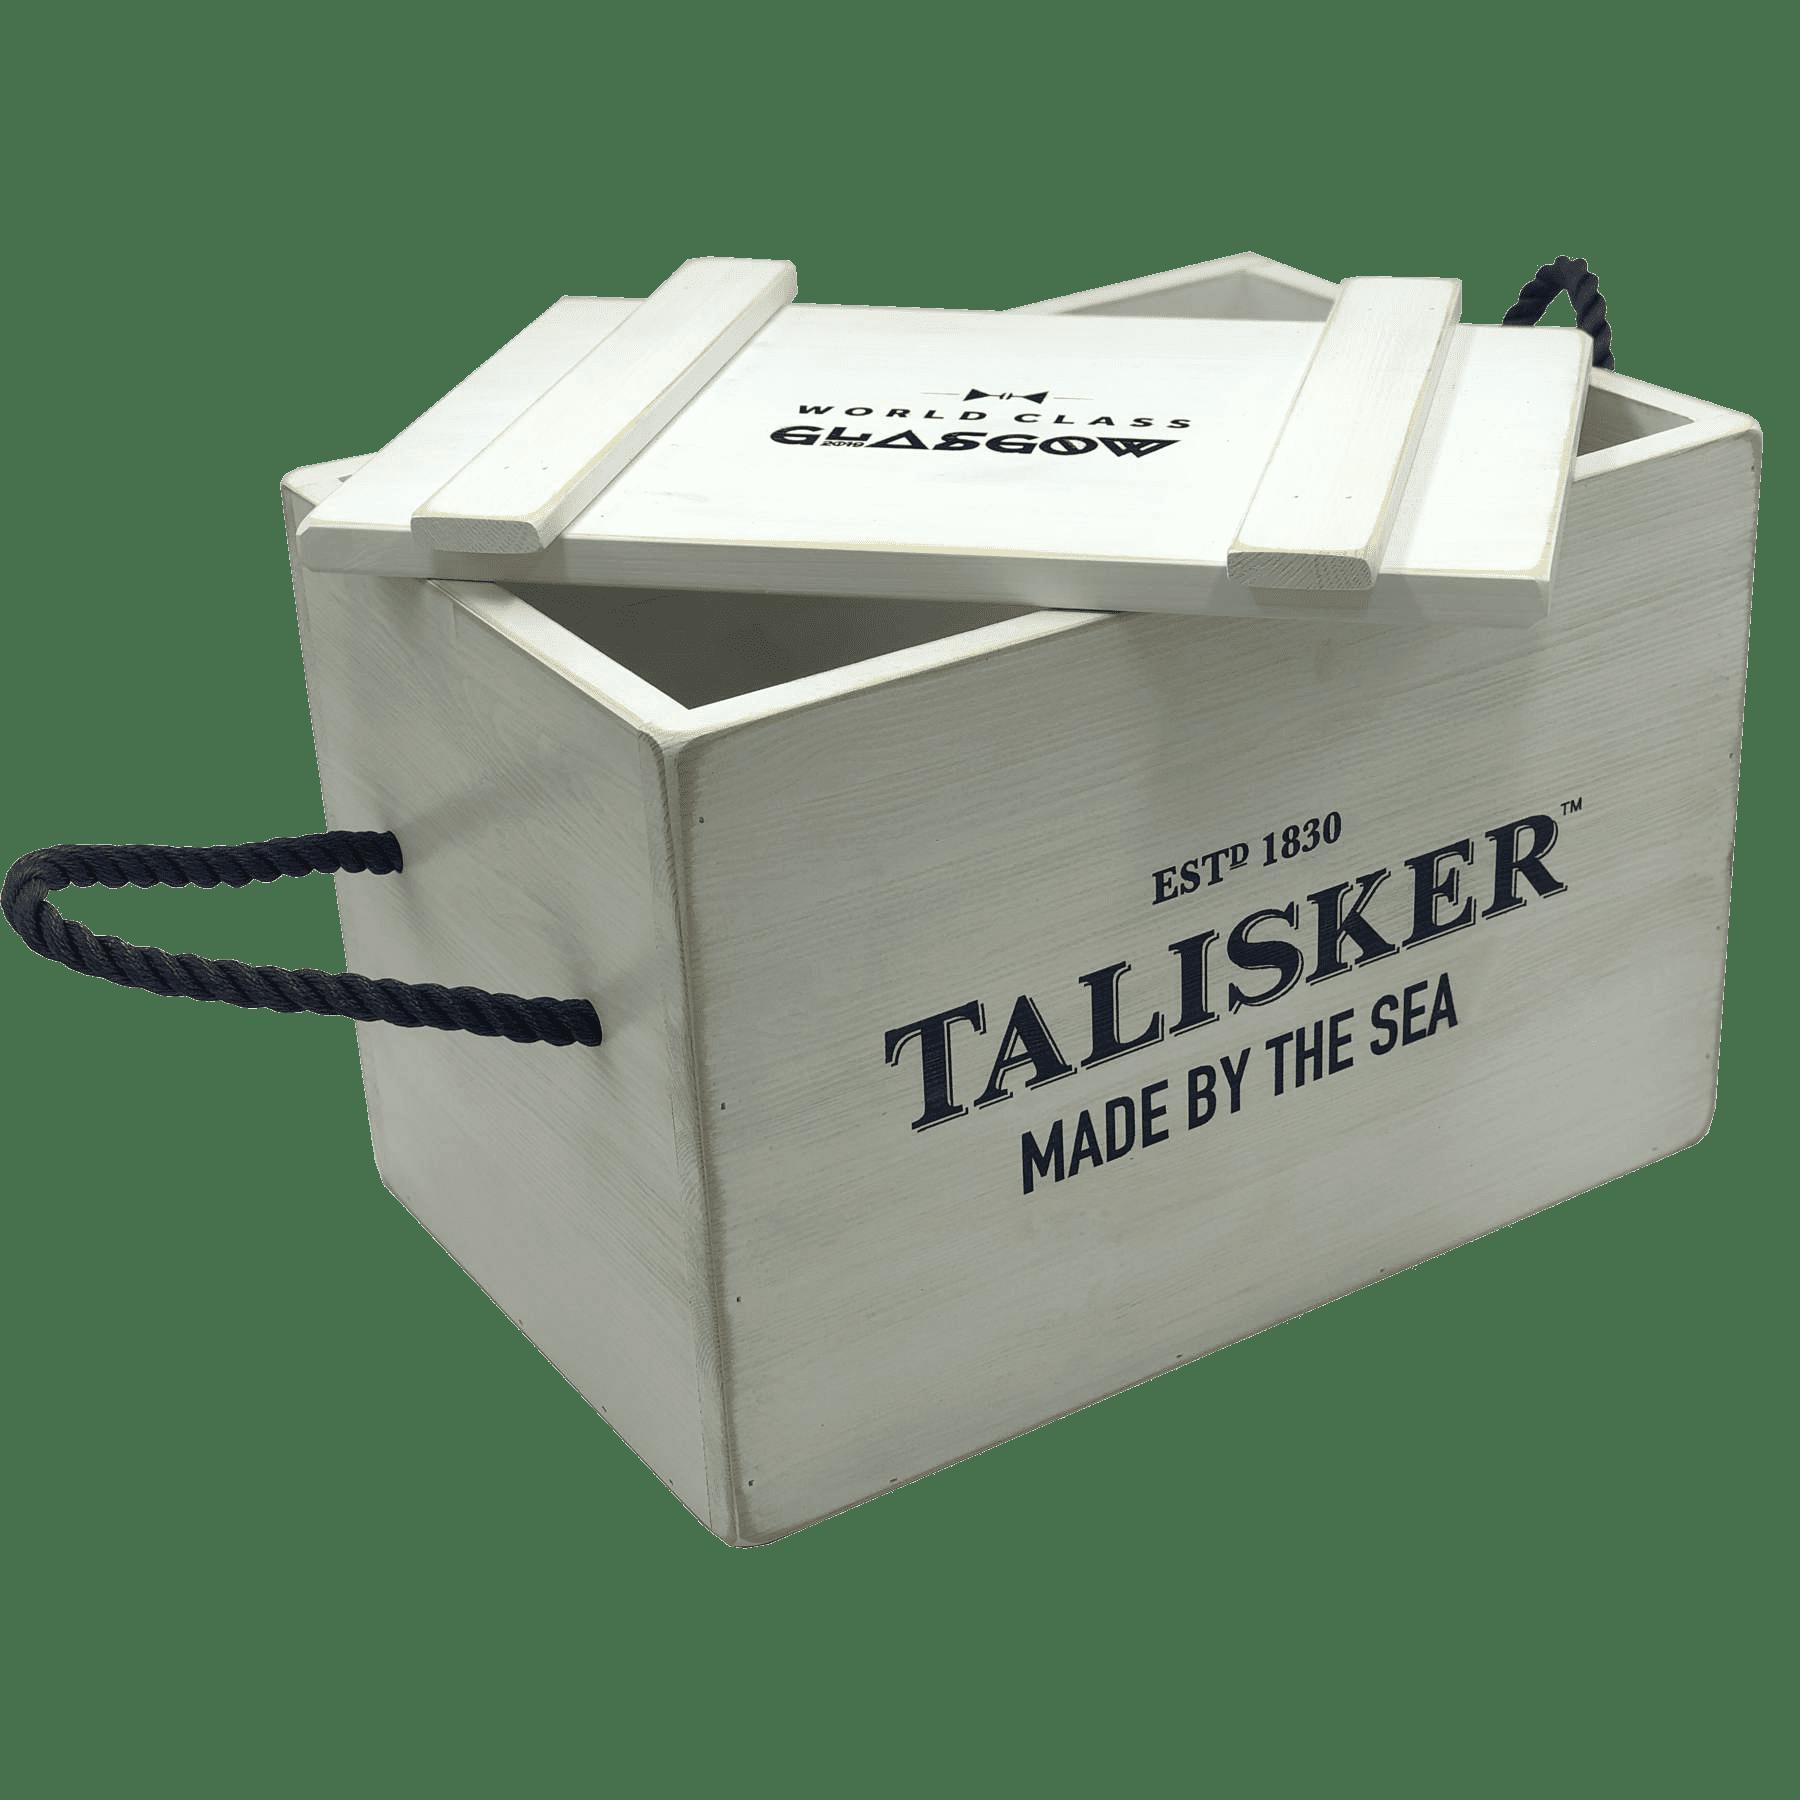 Presentation Talisker Box